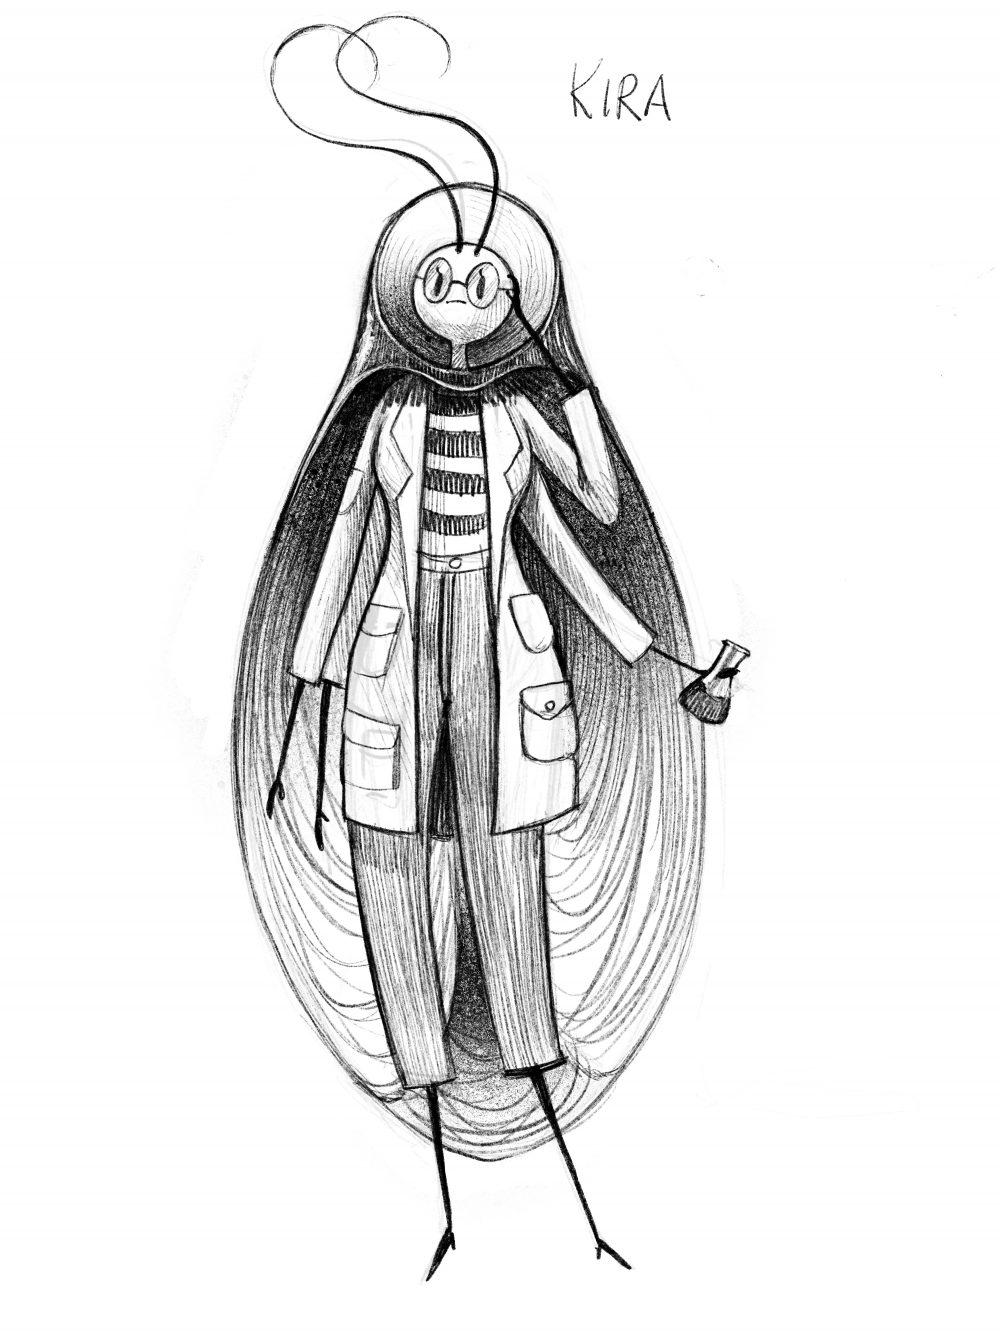 kira-prokki-roaches-sketch